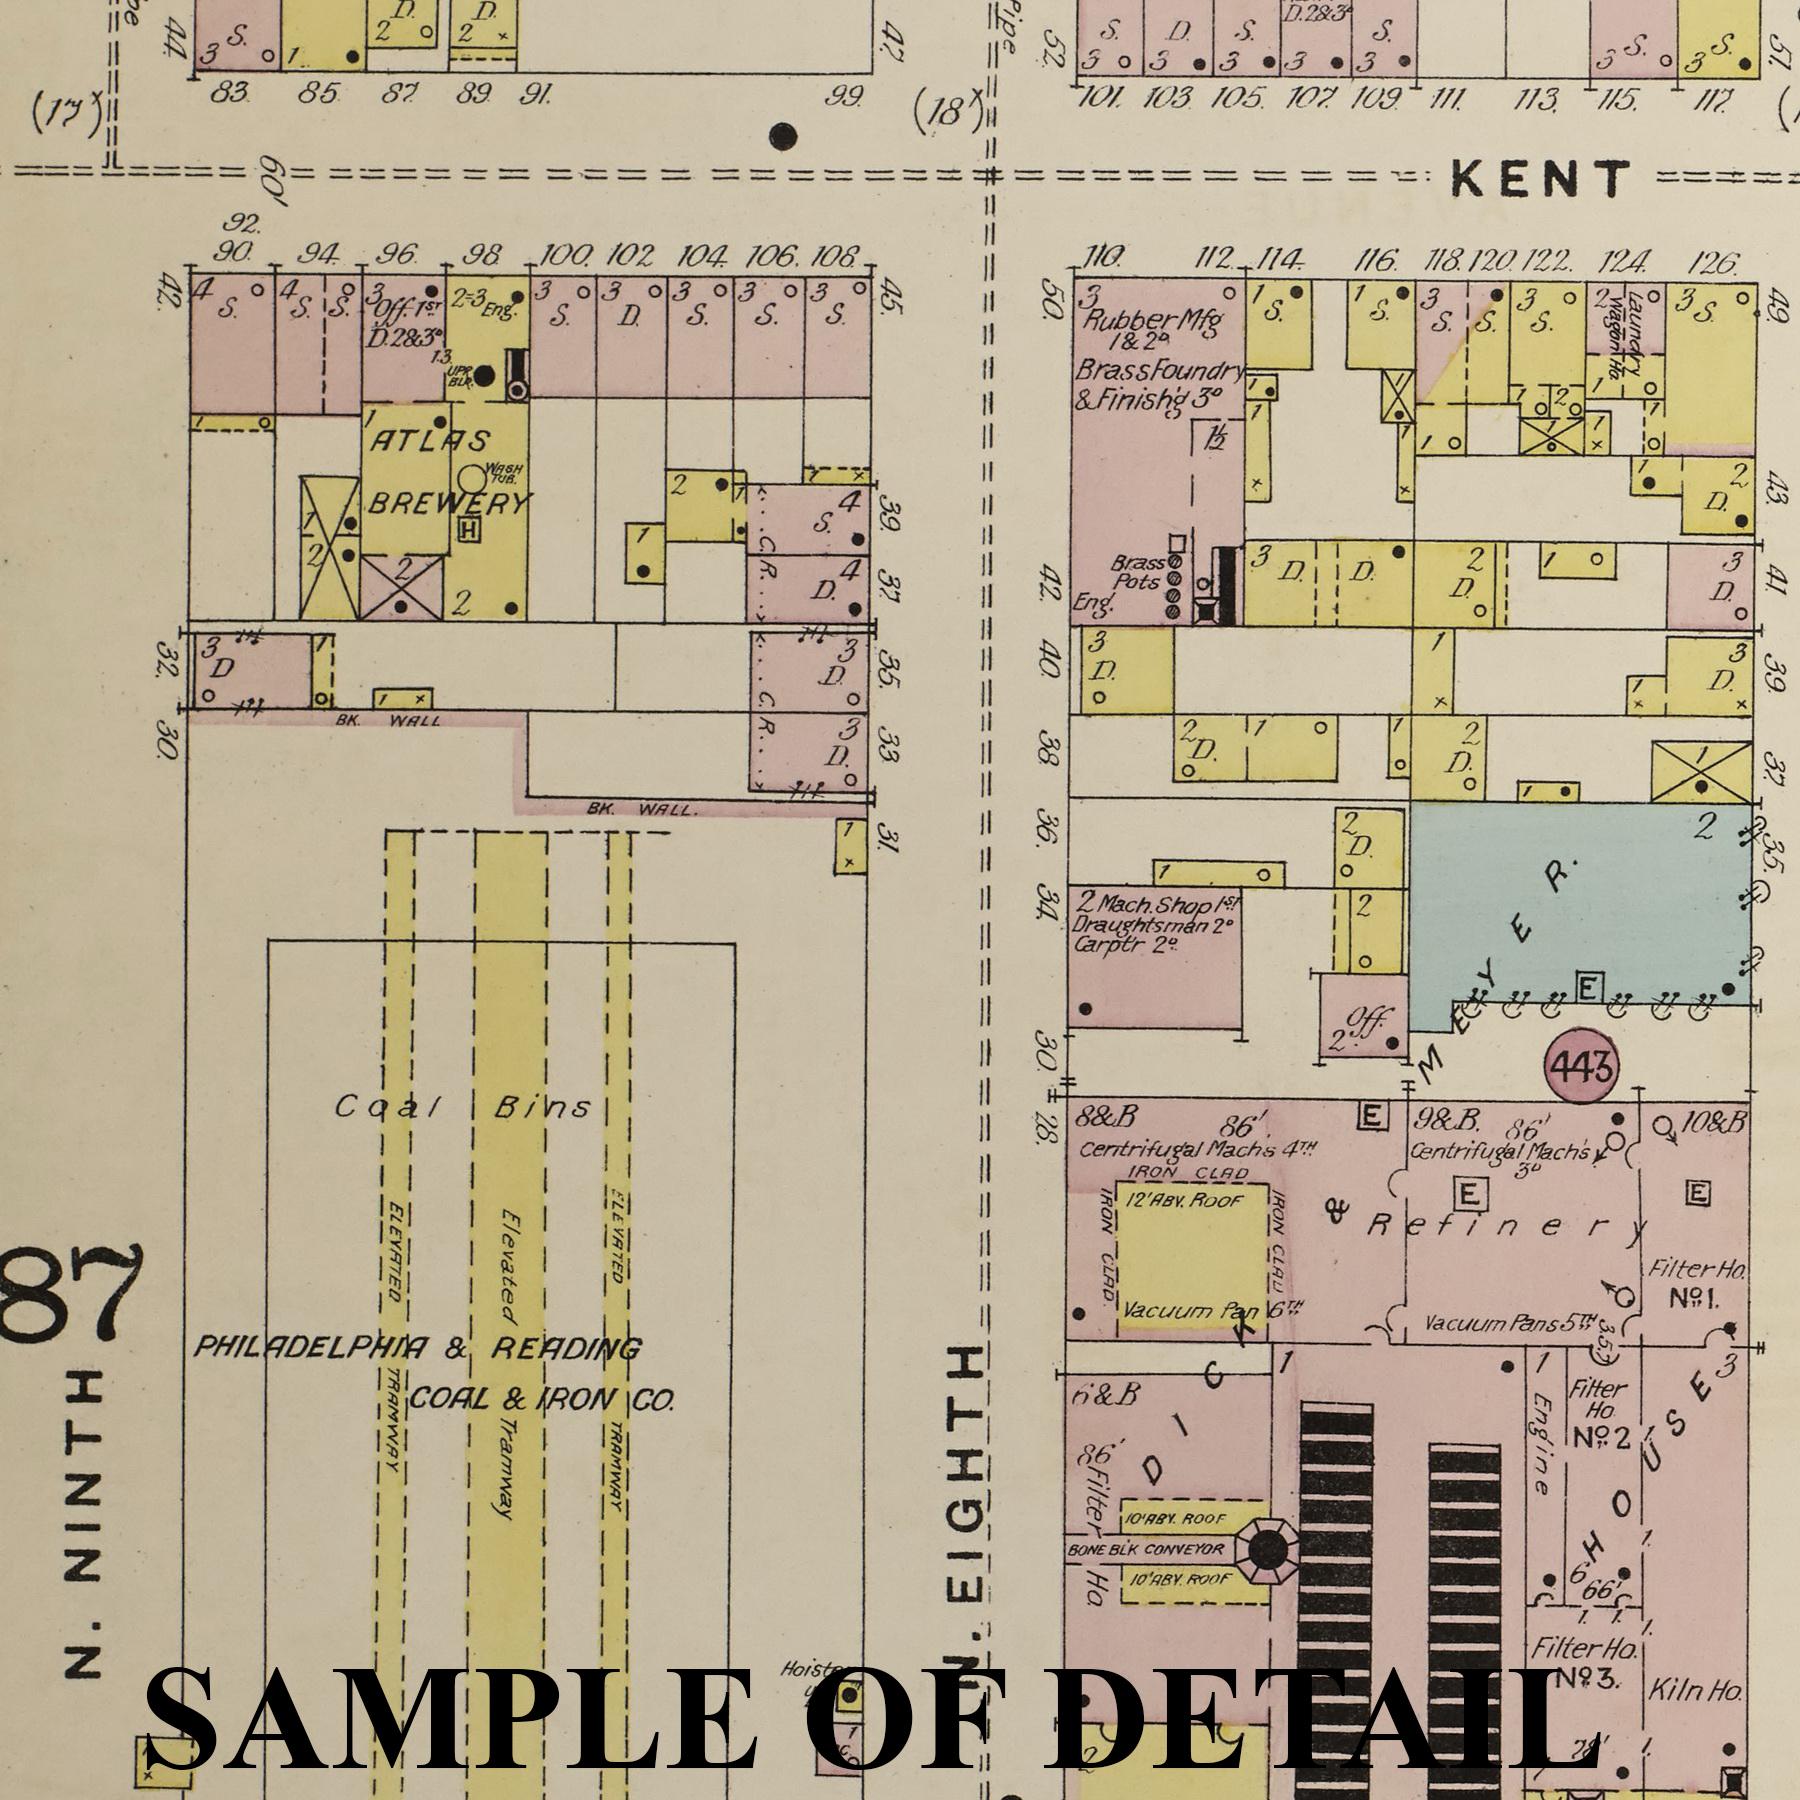 sample-05791-04-1887-0086l.jpg